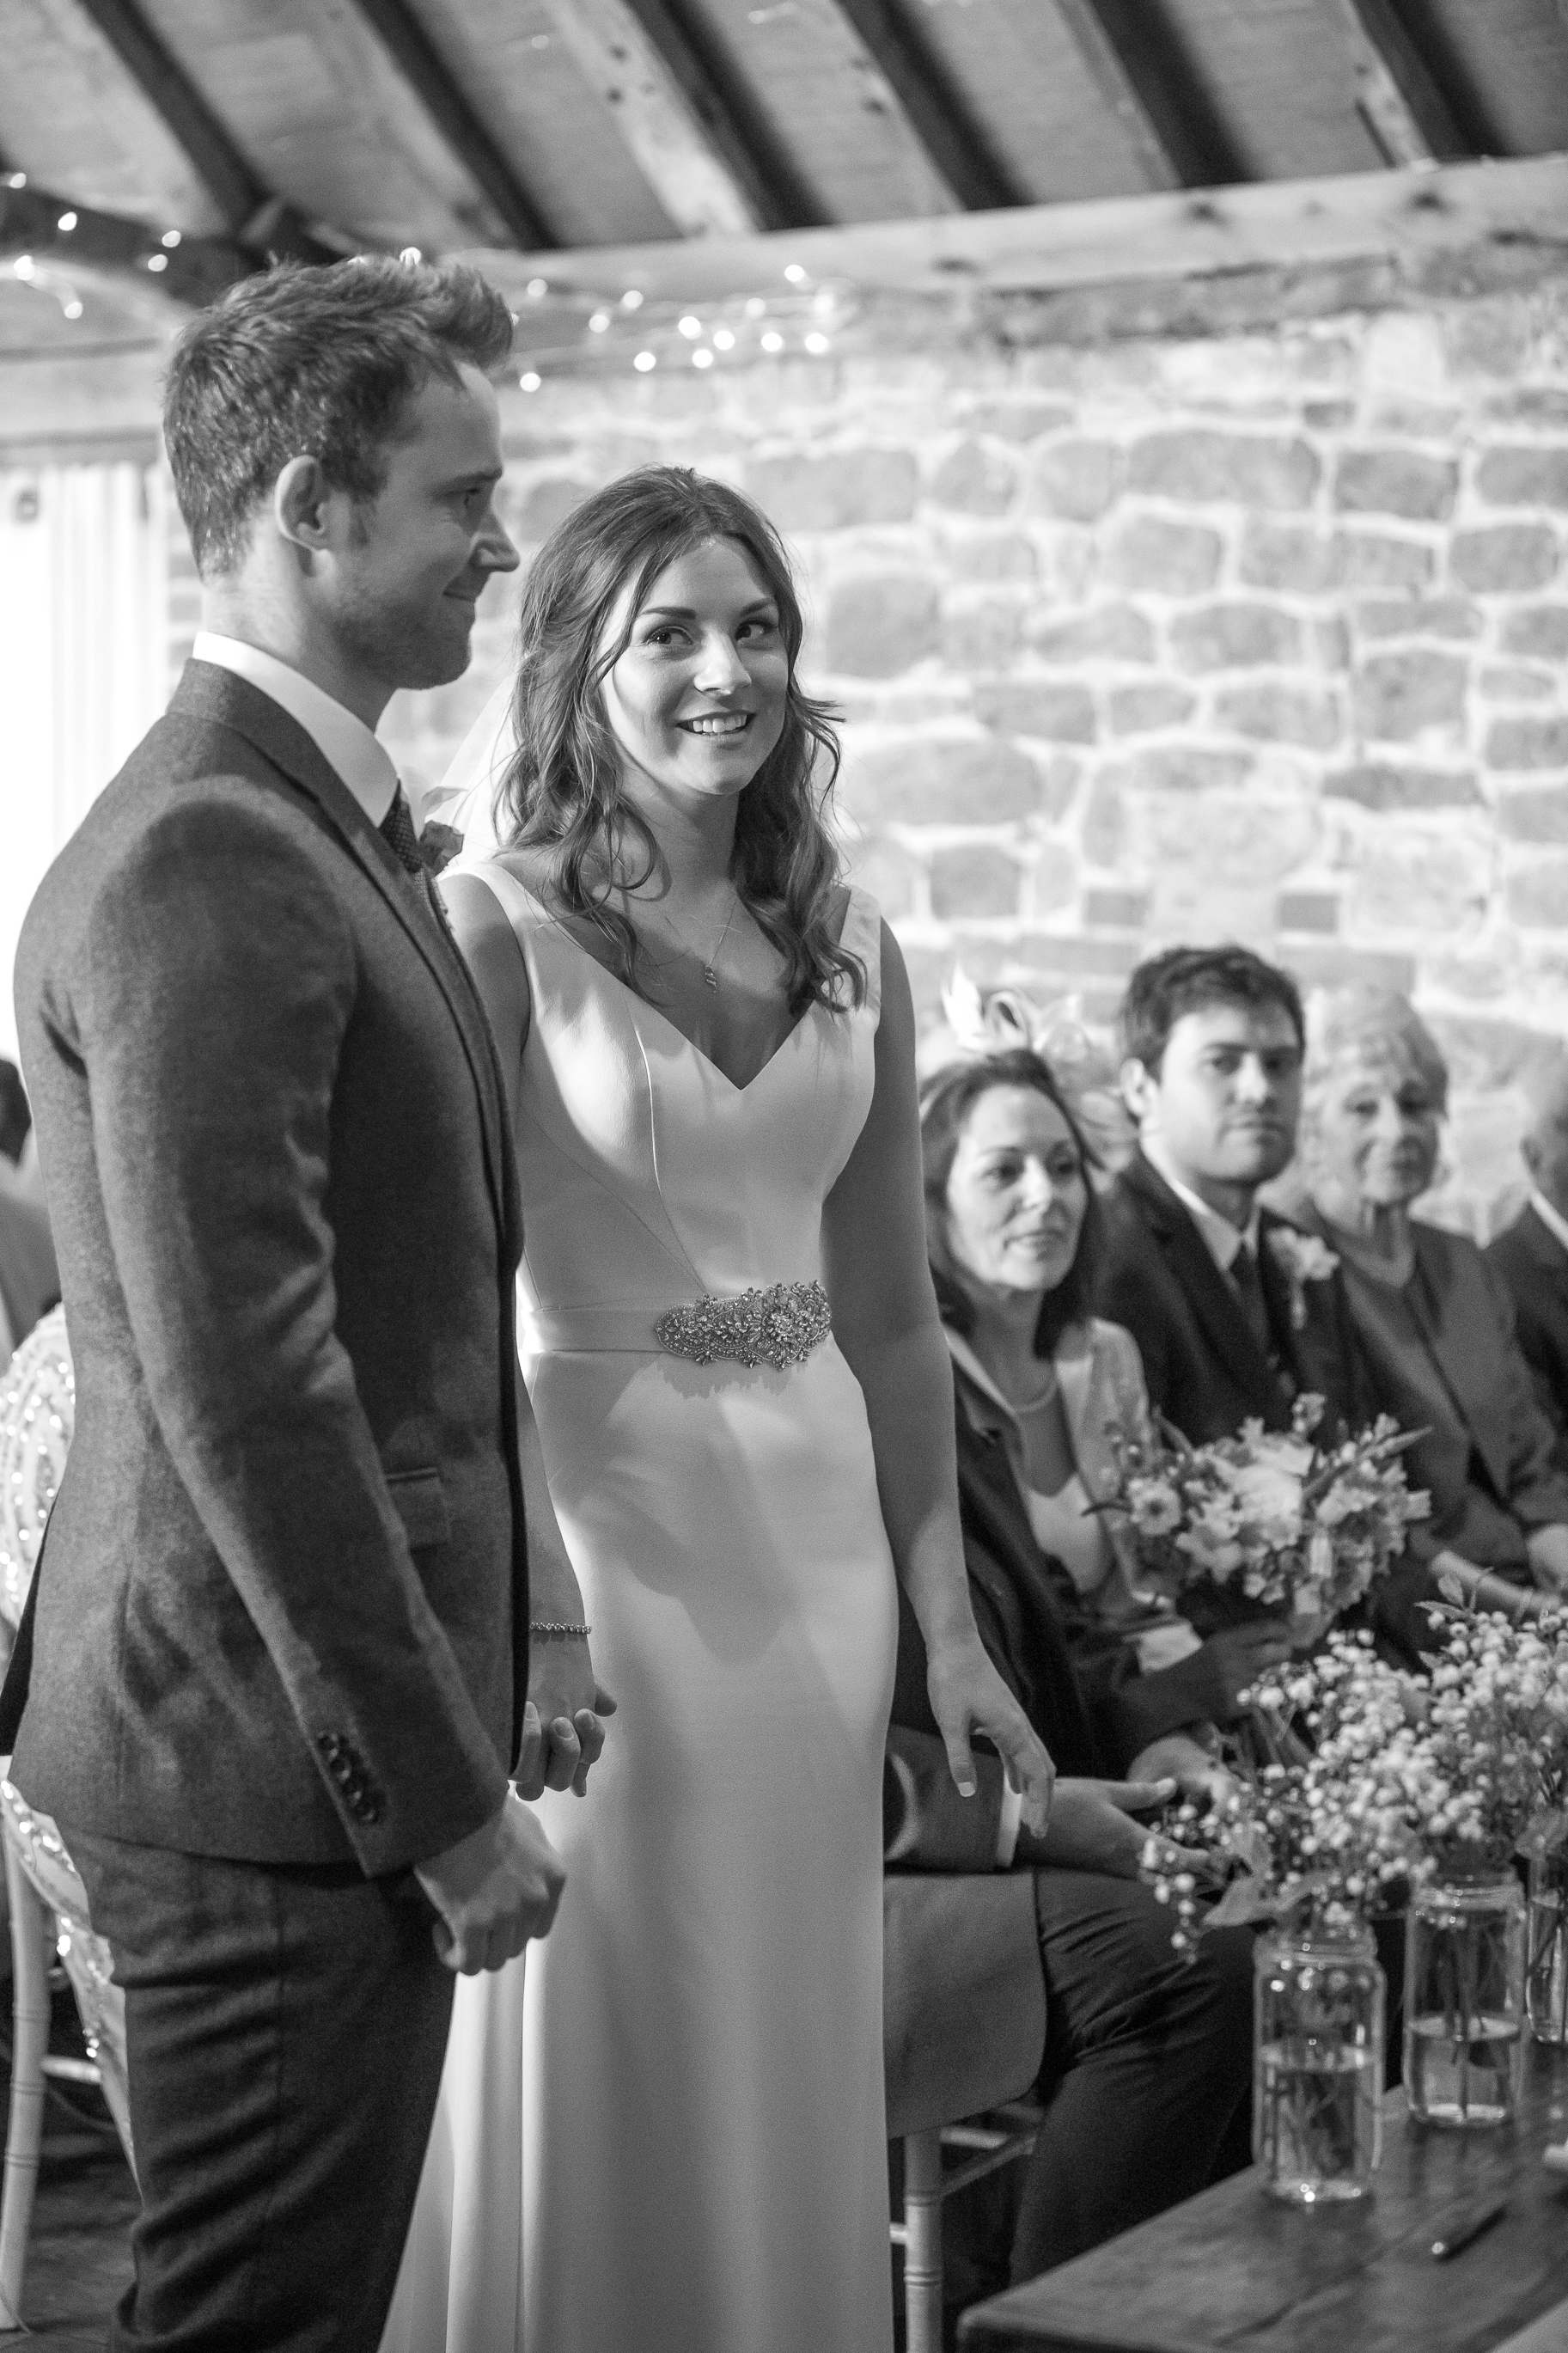 Grittenham Barn female wedding photographers west sussex petworth social-55.jpg